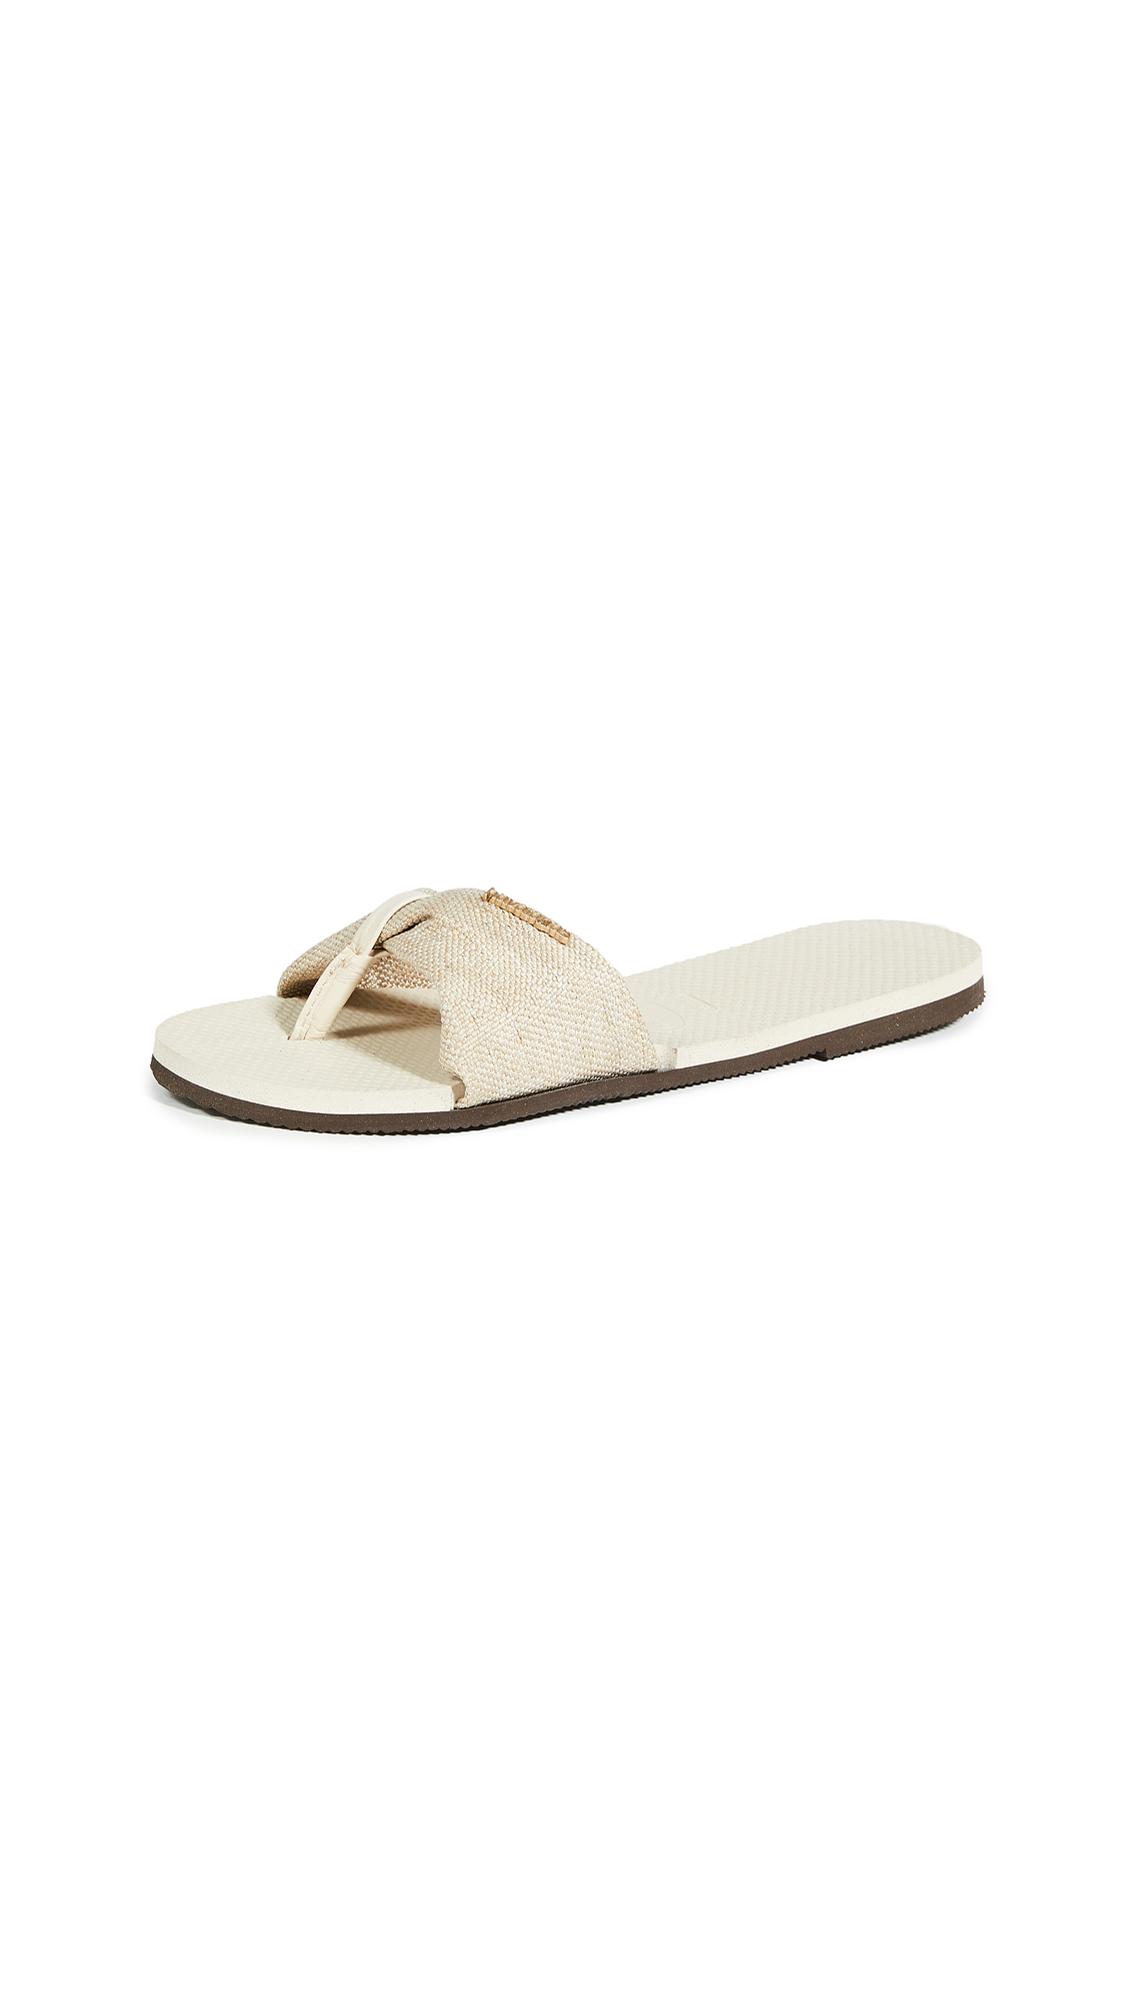 Buy Havaianas You St. Tropez Material Flip Flops online, shop Havaianas